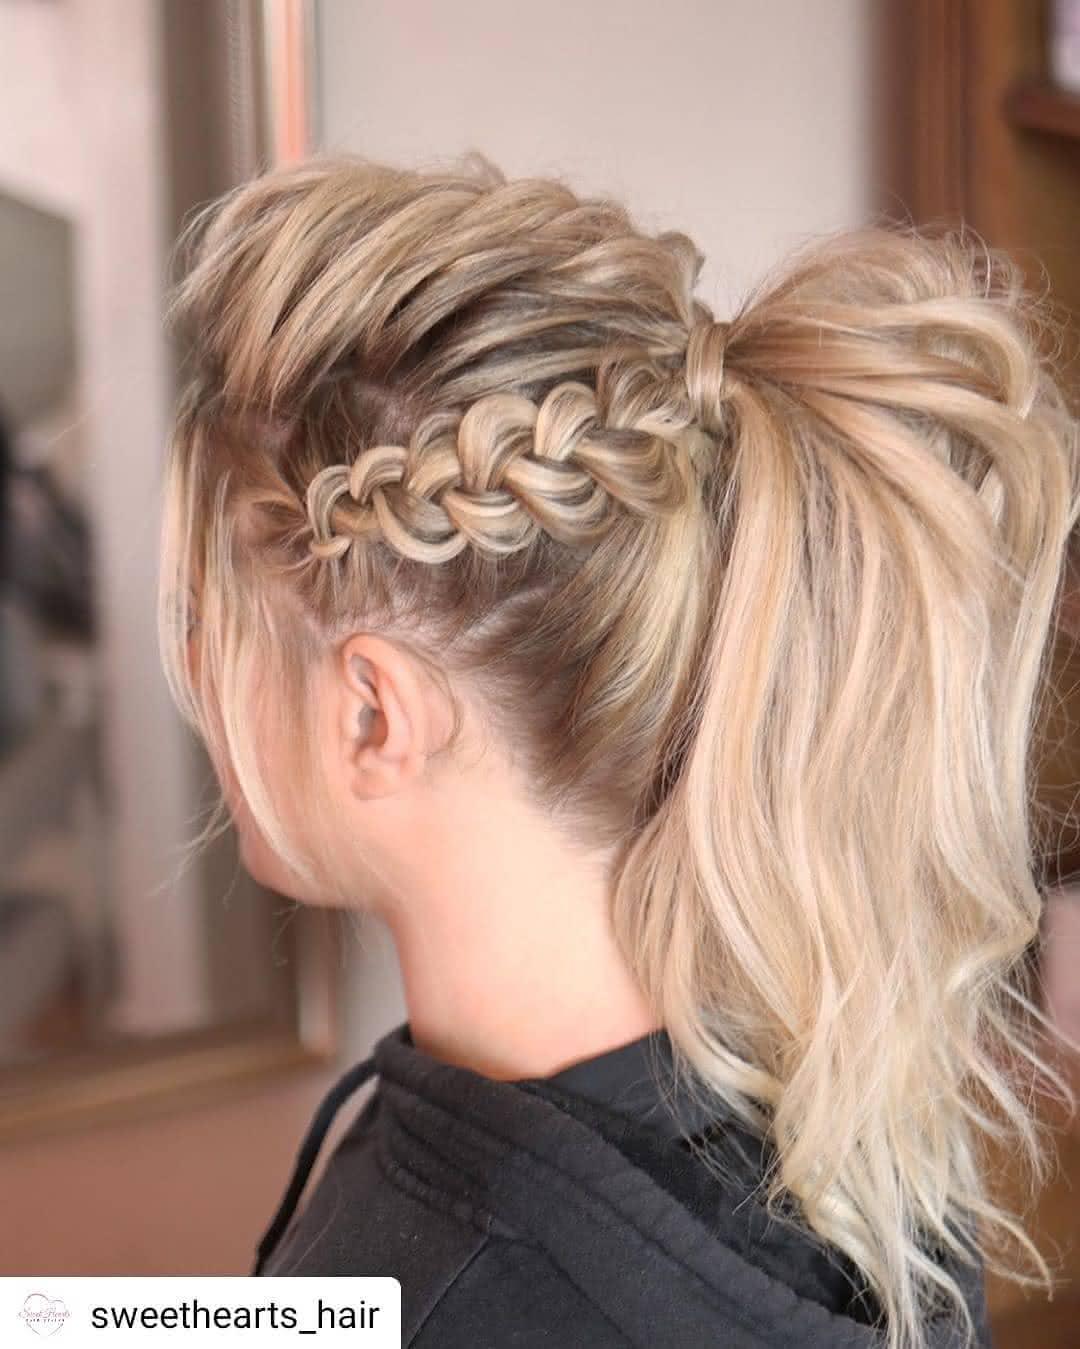 penteado-cabelo-preso